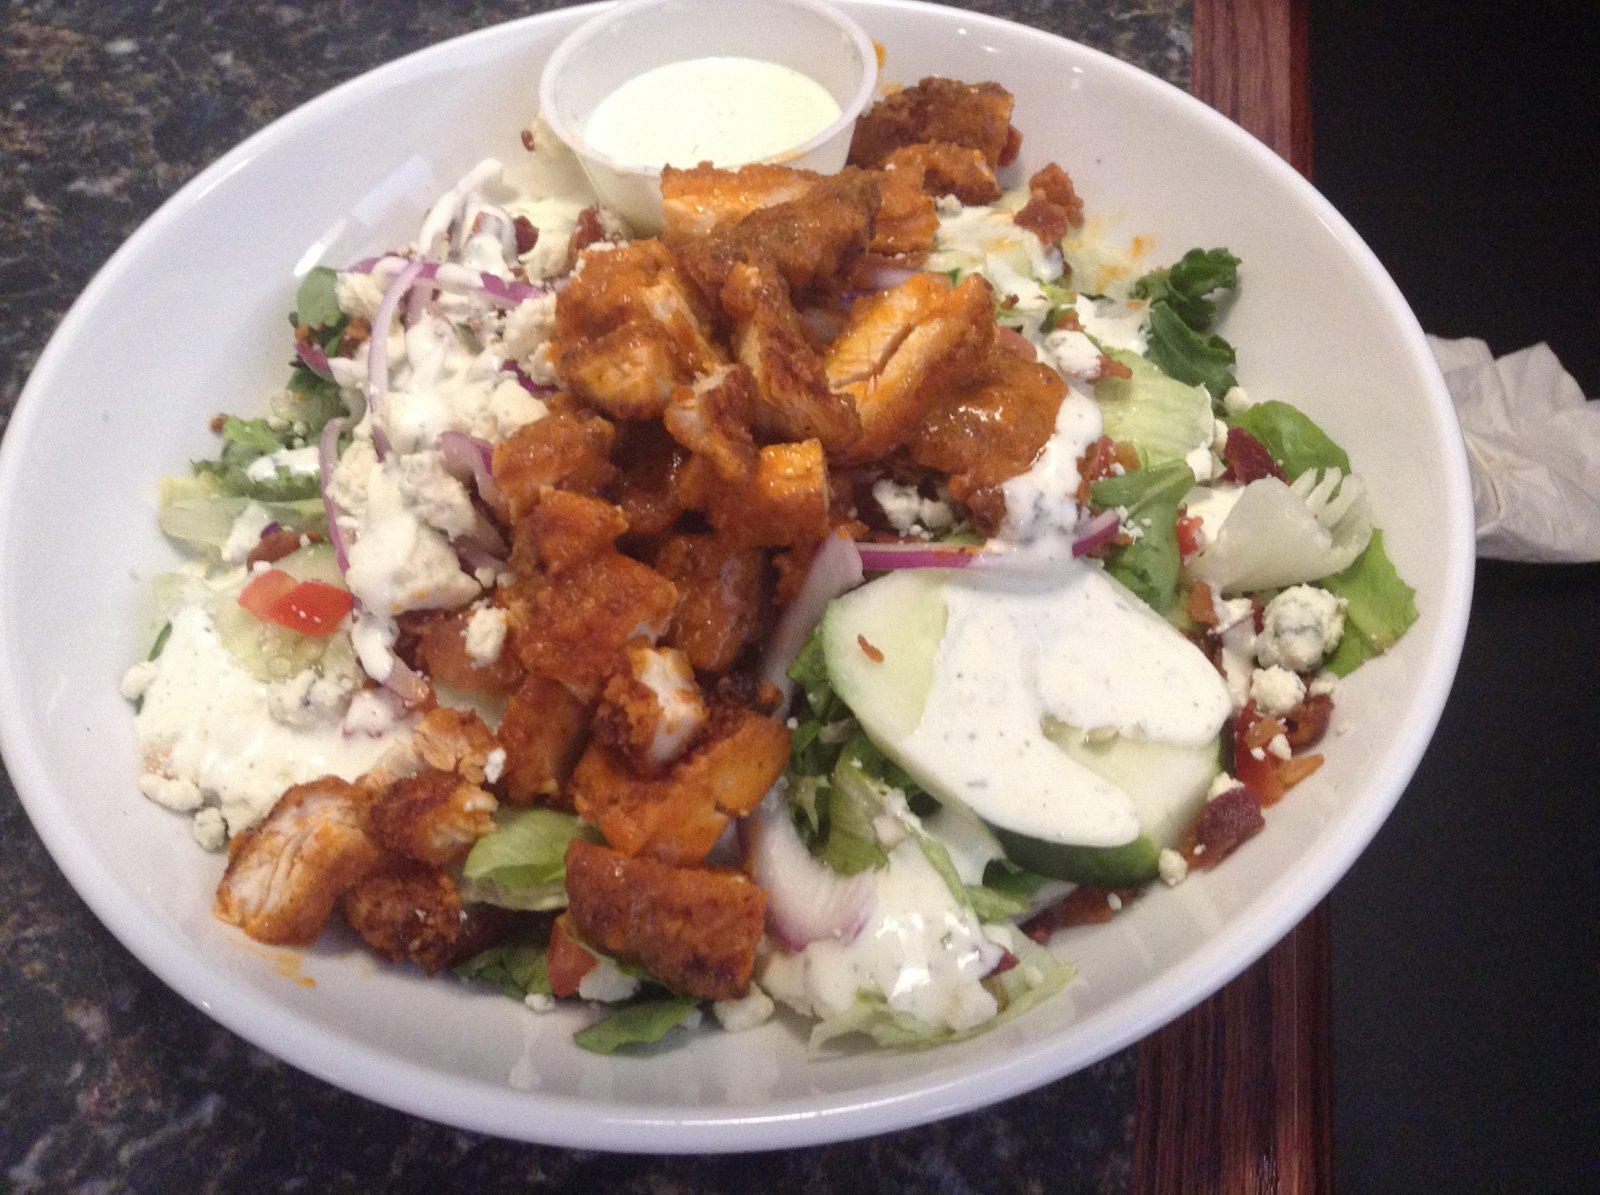 On the Menu: Crispy Buffalo Chicken Salad